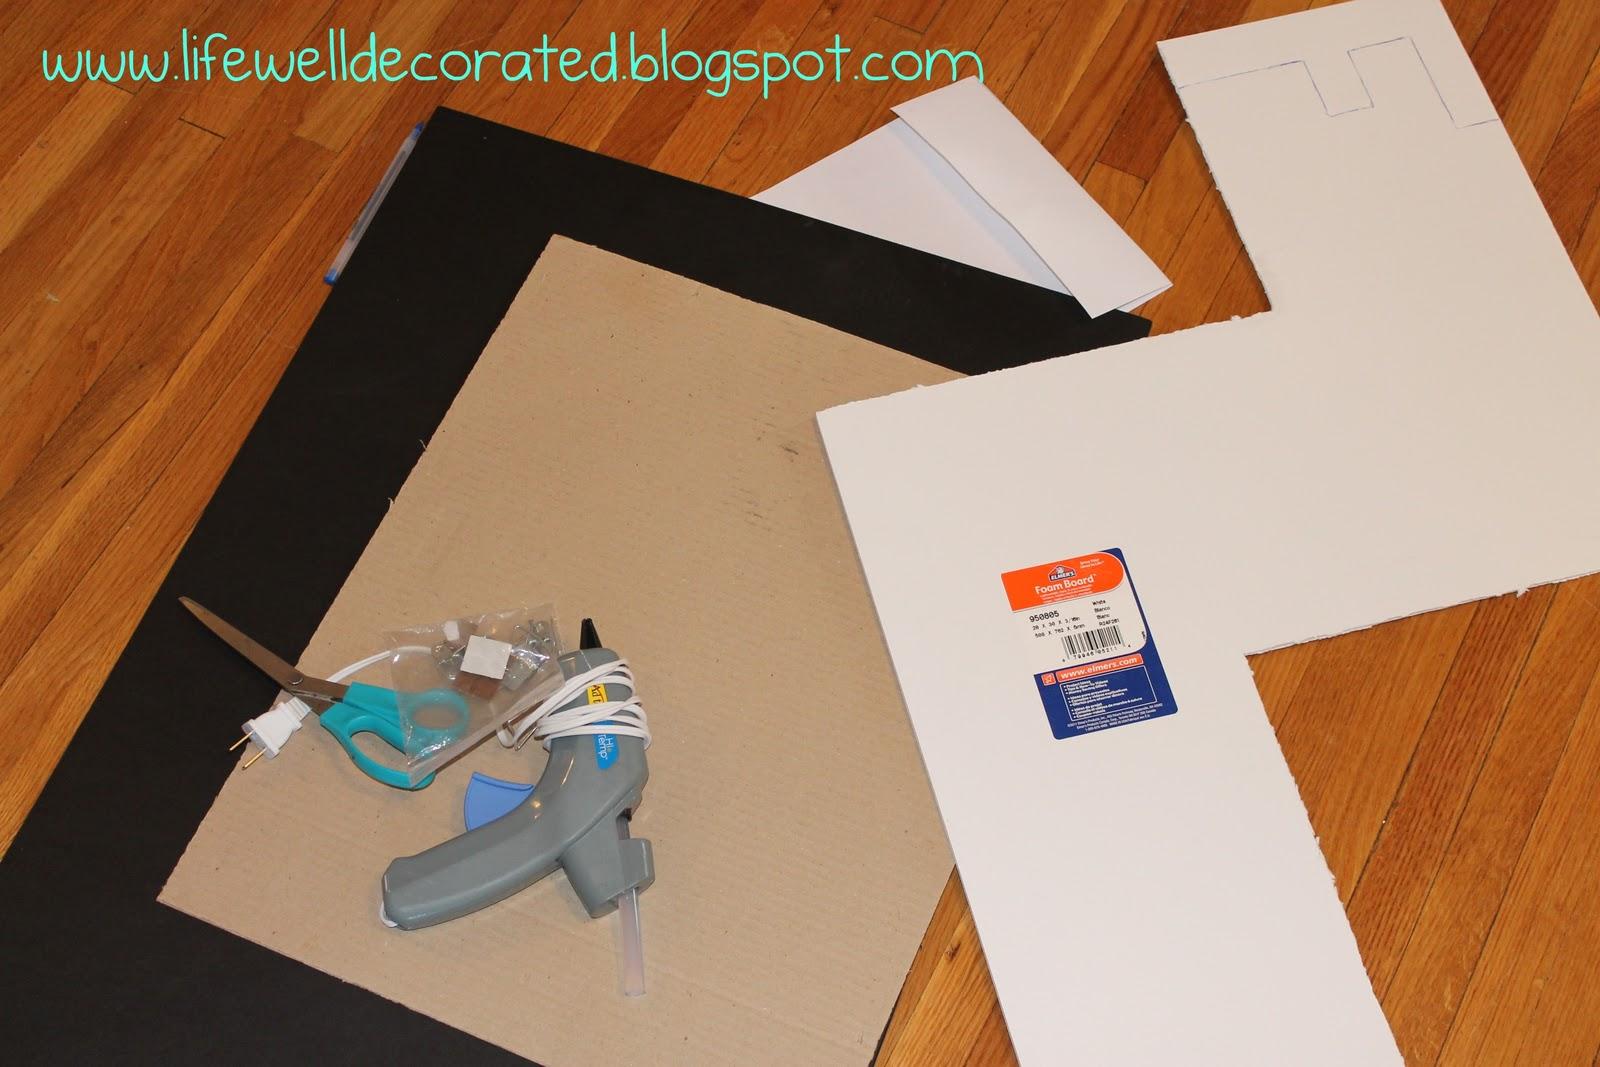 http://2.bp.blogspot.com/-6iD5WIeFK0I/TyX0prLCF7I/AAAAAAAAAEQ/eeKkC38_UcM/s1600/foam+board+supplies.jpg